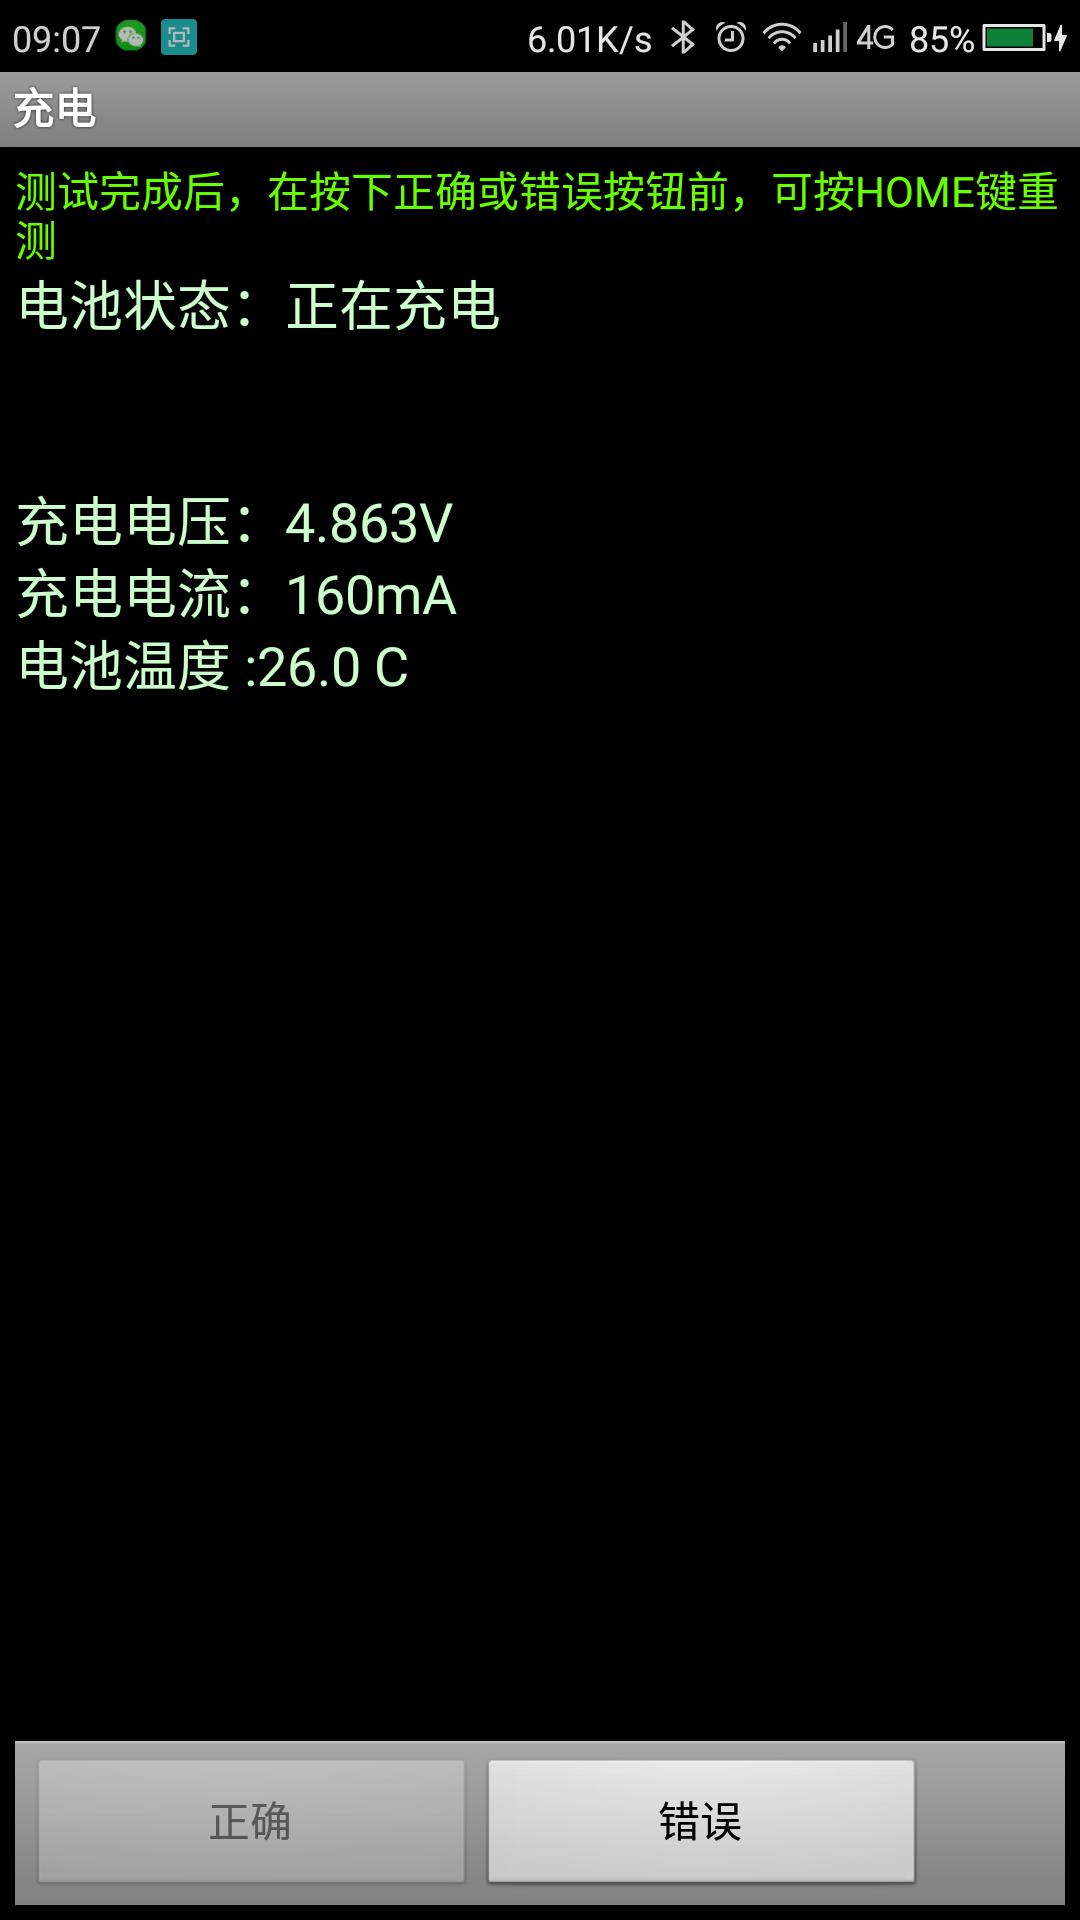 Screenshot_2017-01-25-09-07-09.png